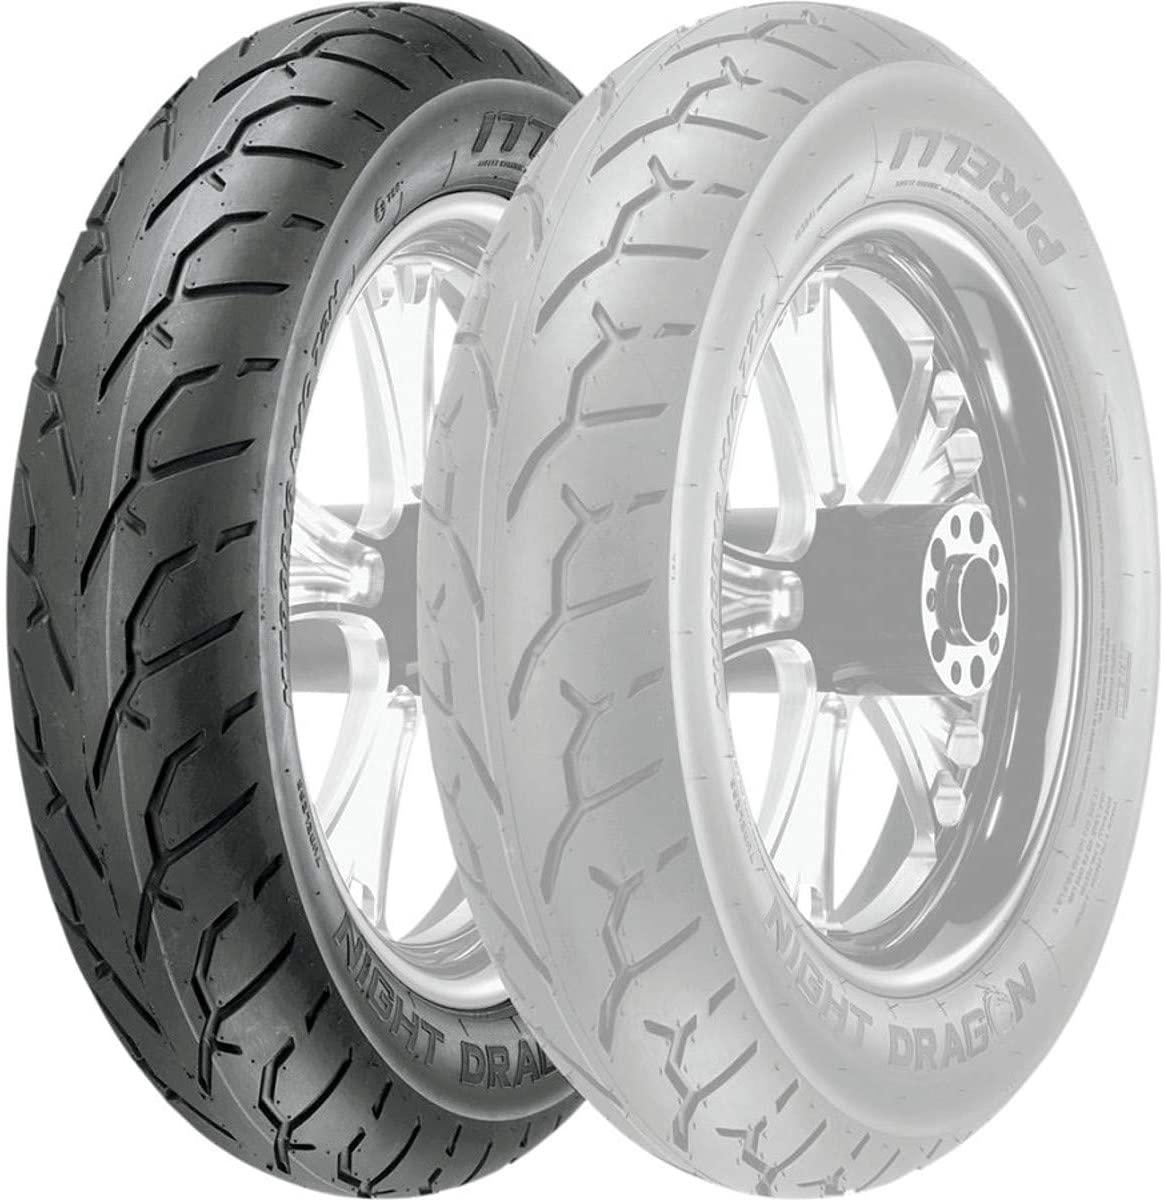 Pirelli Night Dragon Front Tire (150/80-16)